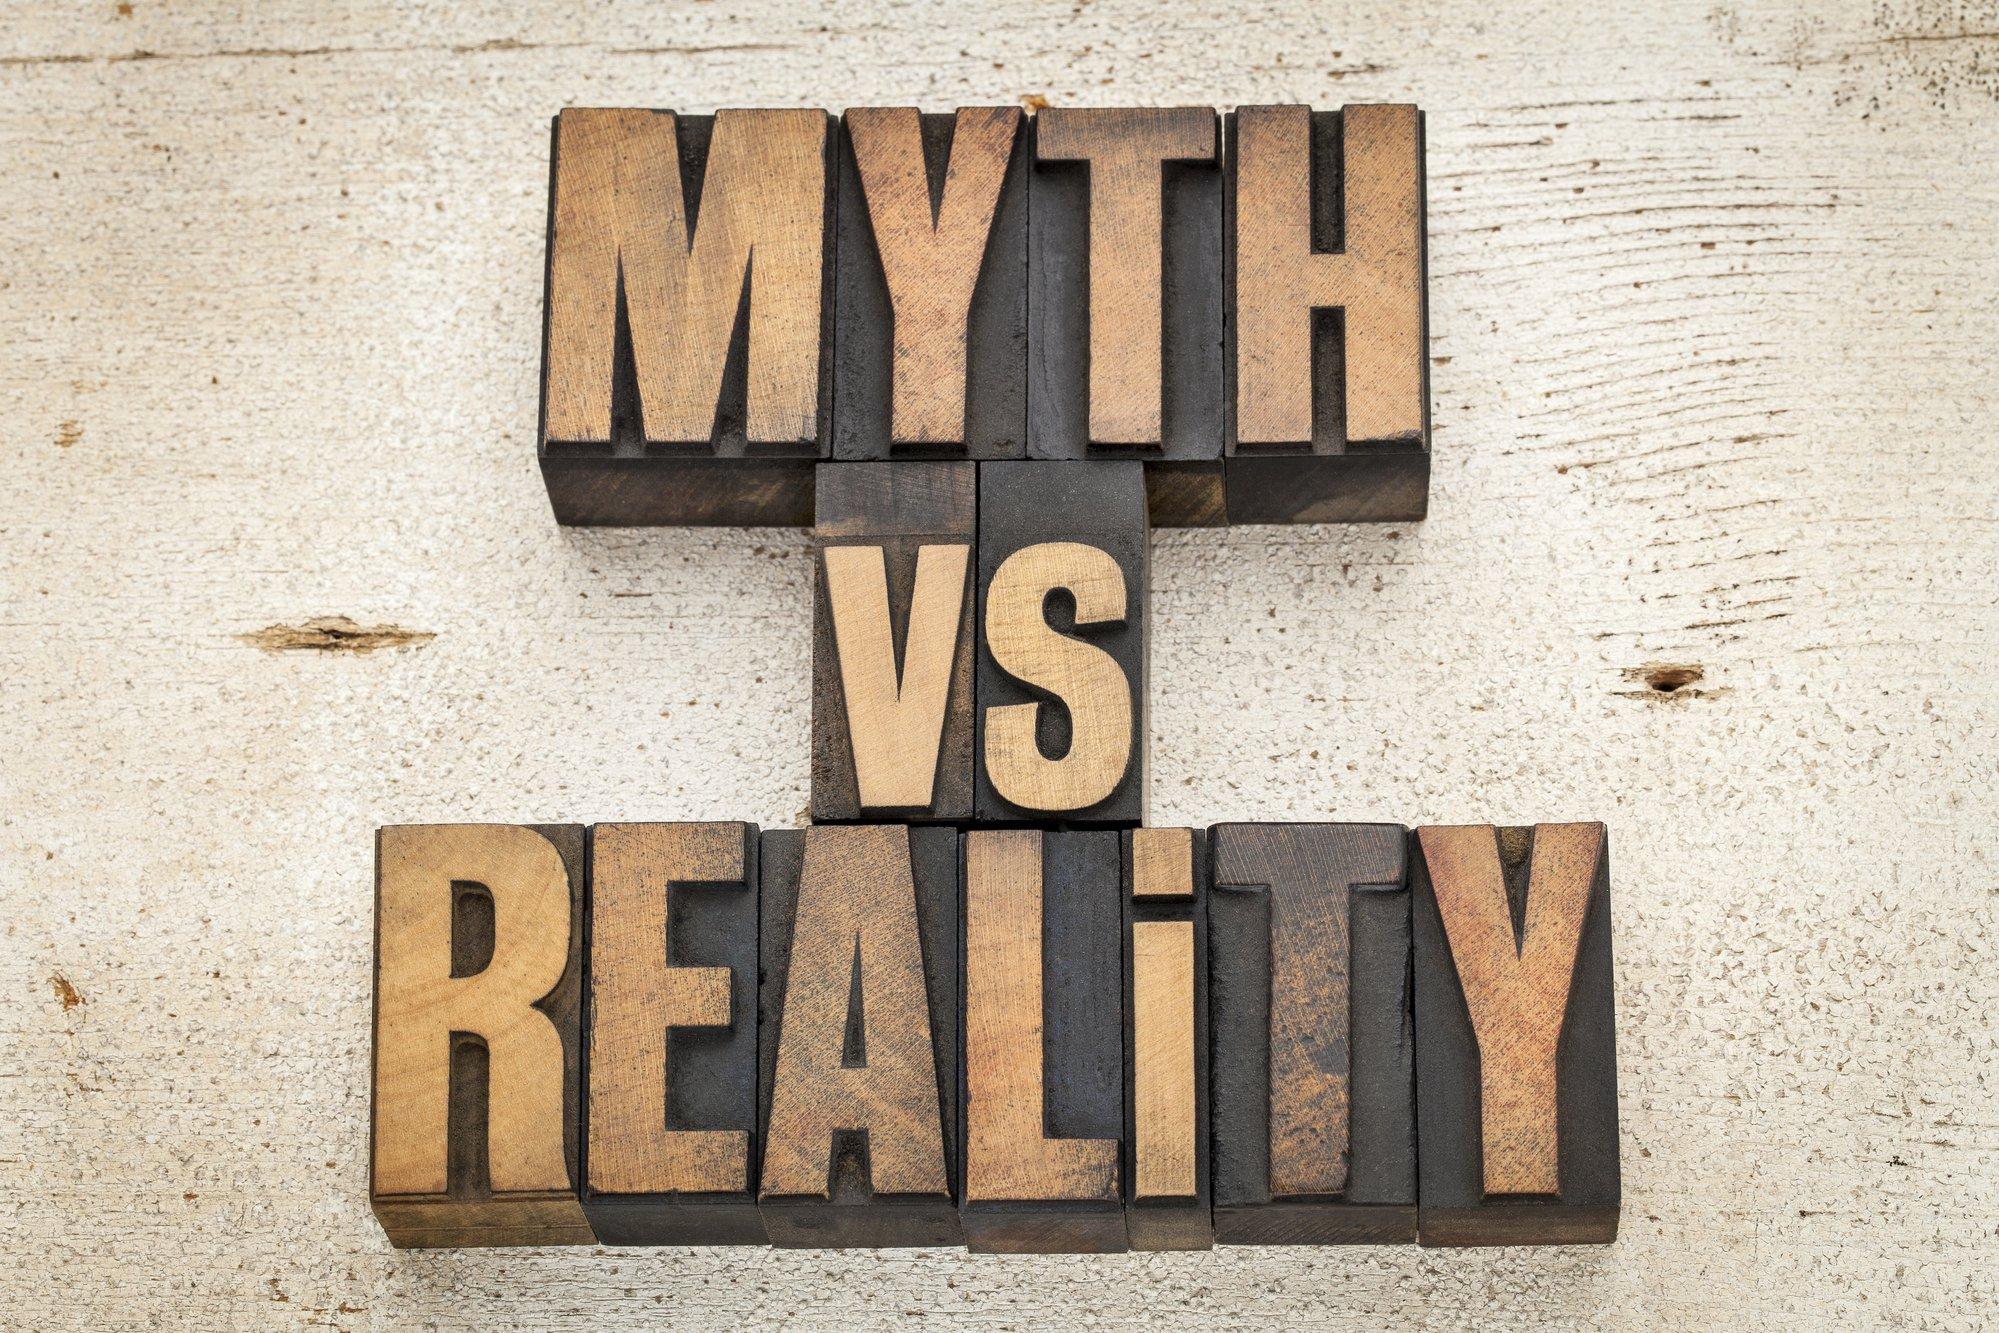 Top 3 digital marketing myths debunked